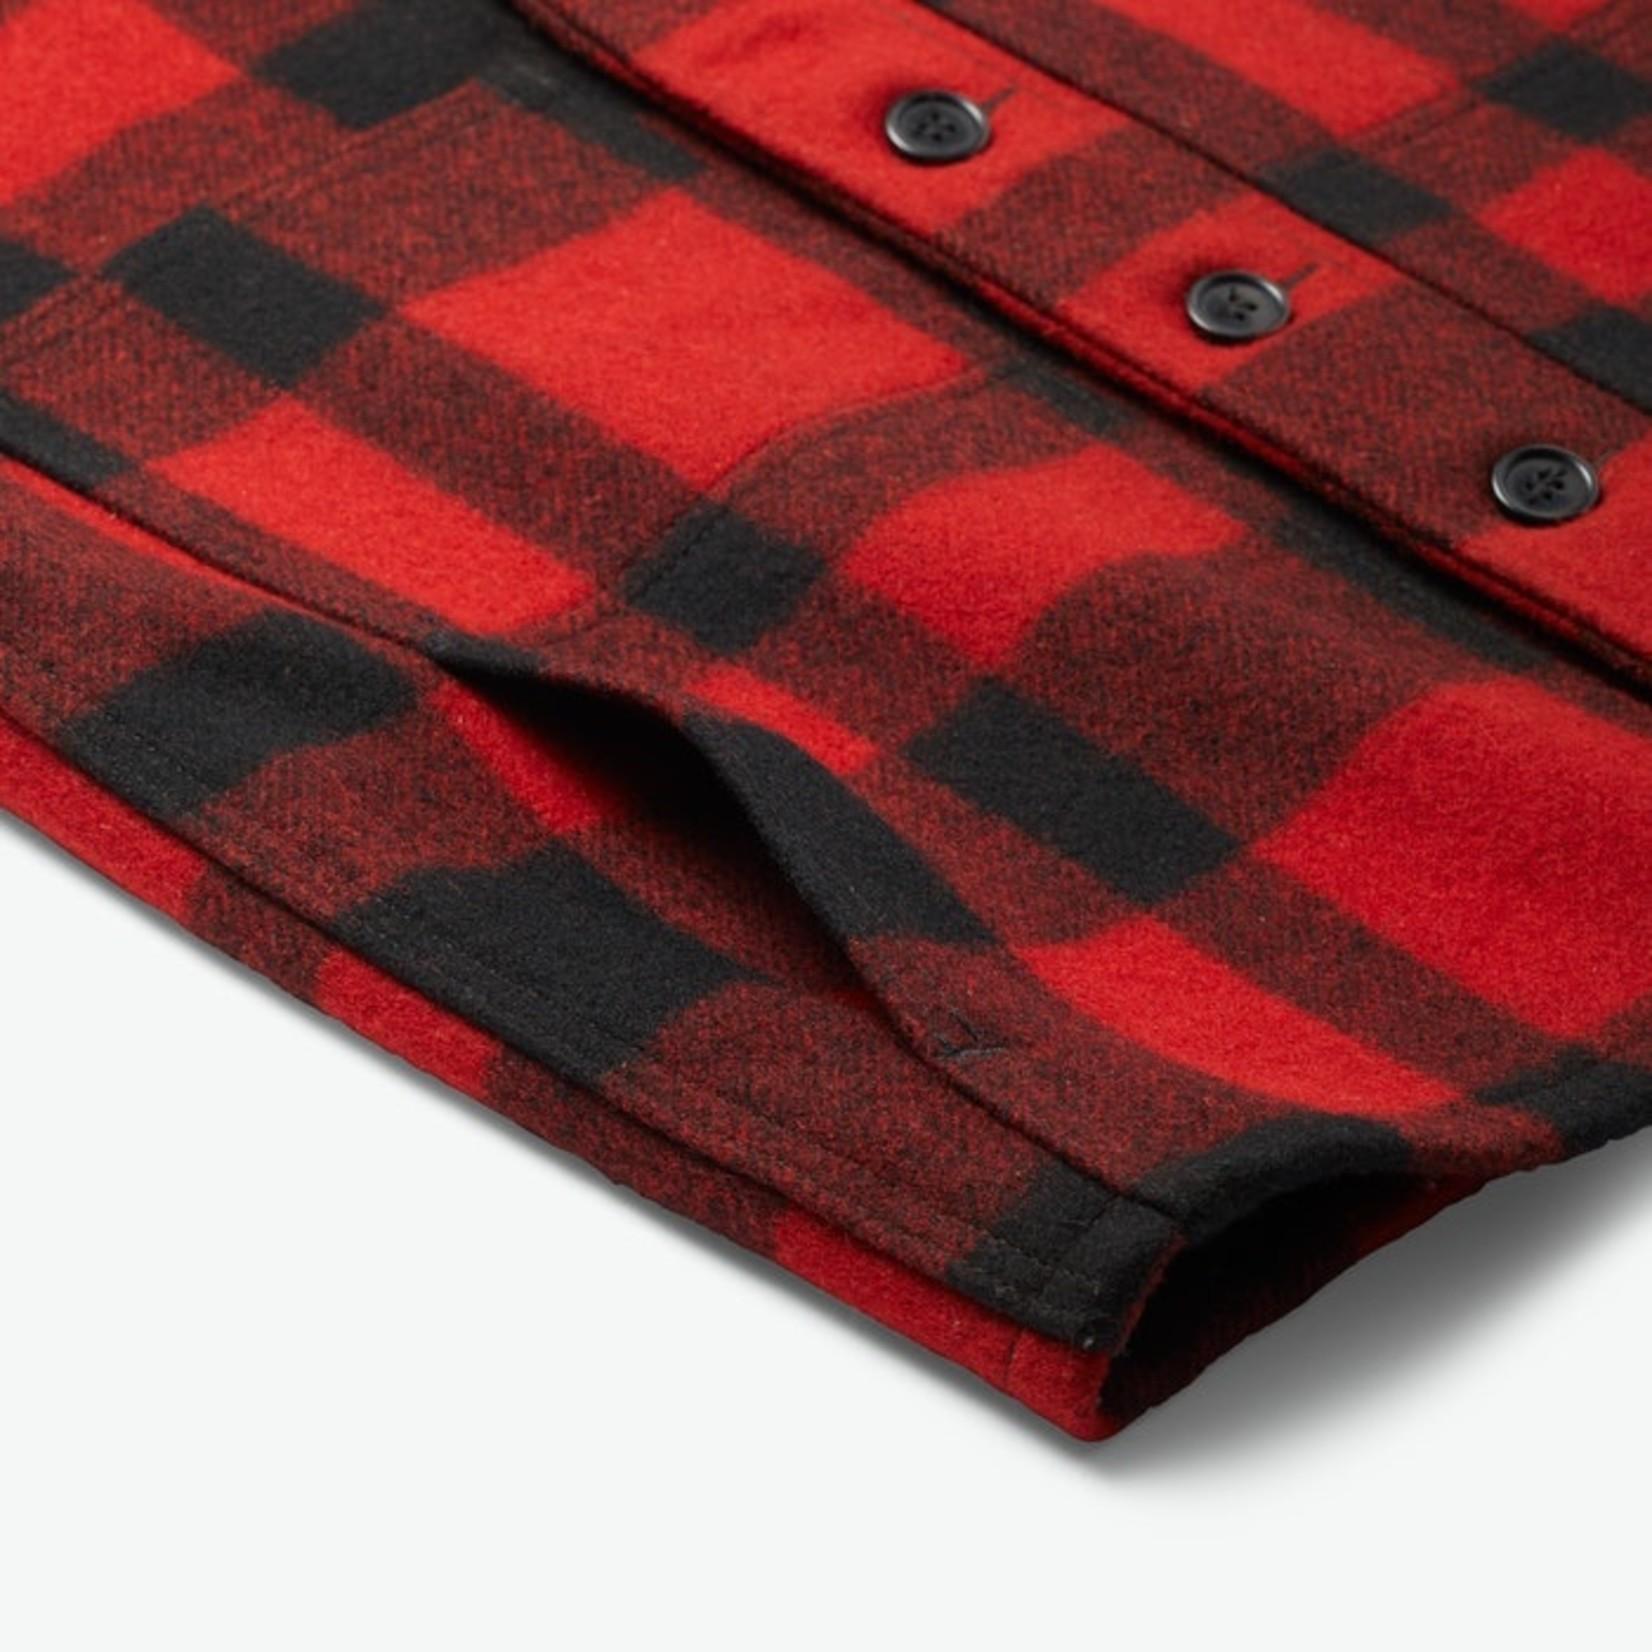 Filson Filson 11010055 Mackinaw Wool Vest - Red and Black